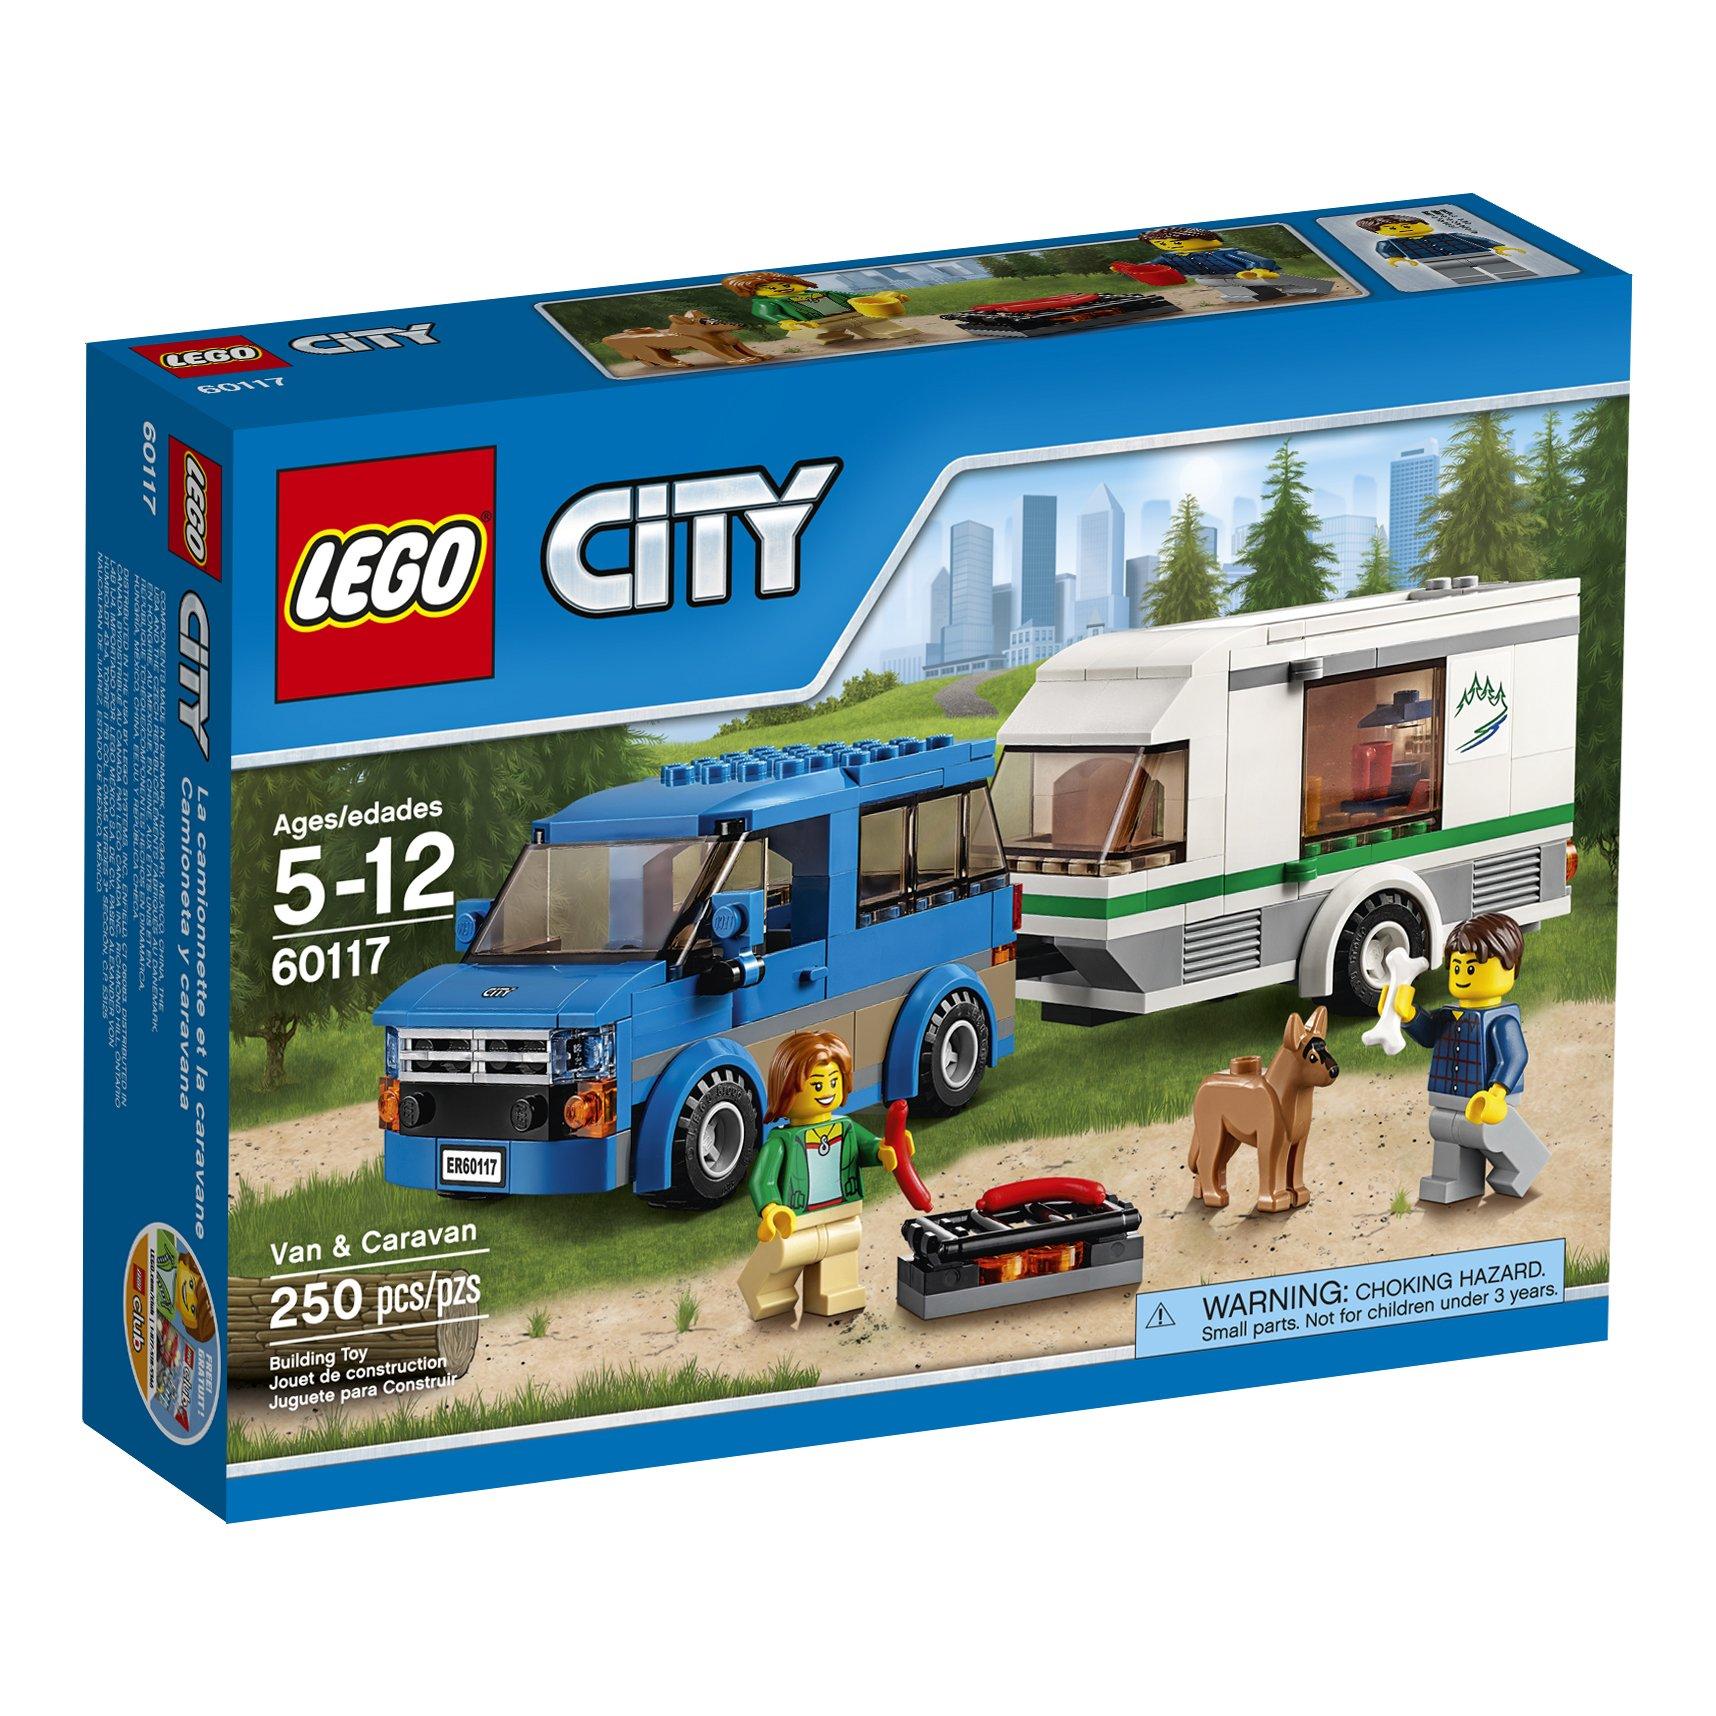 Lego City Van Caravan Construction Toys For Boys Girls Kids